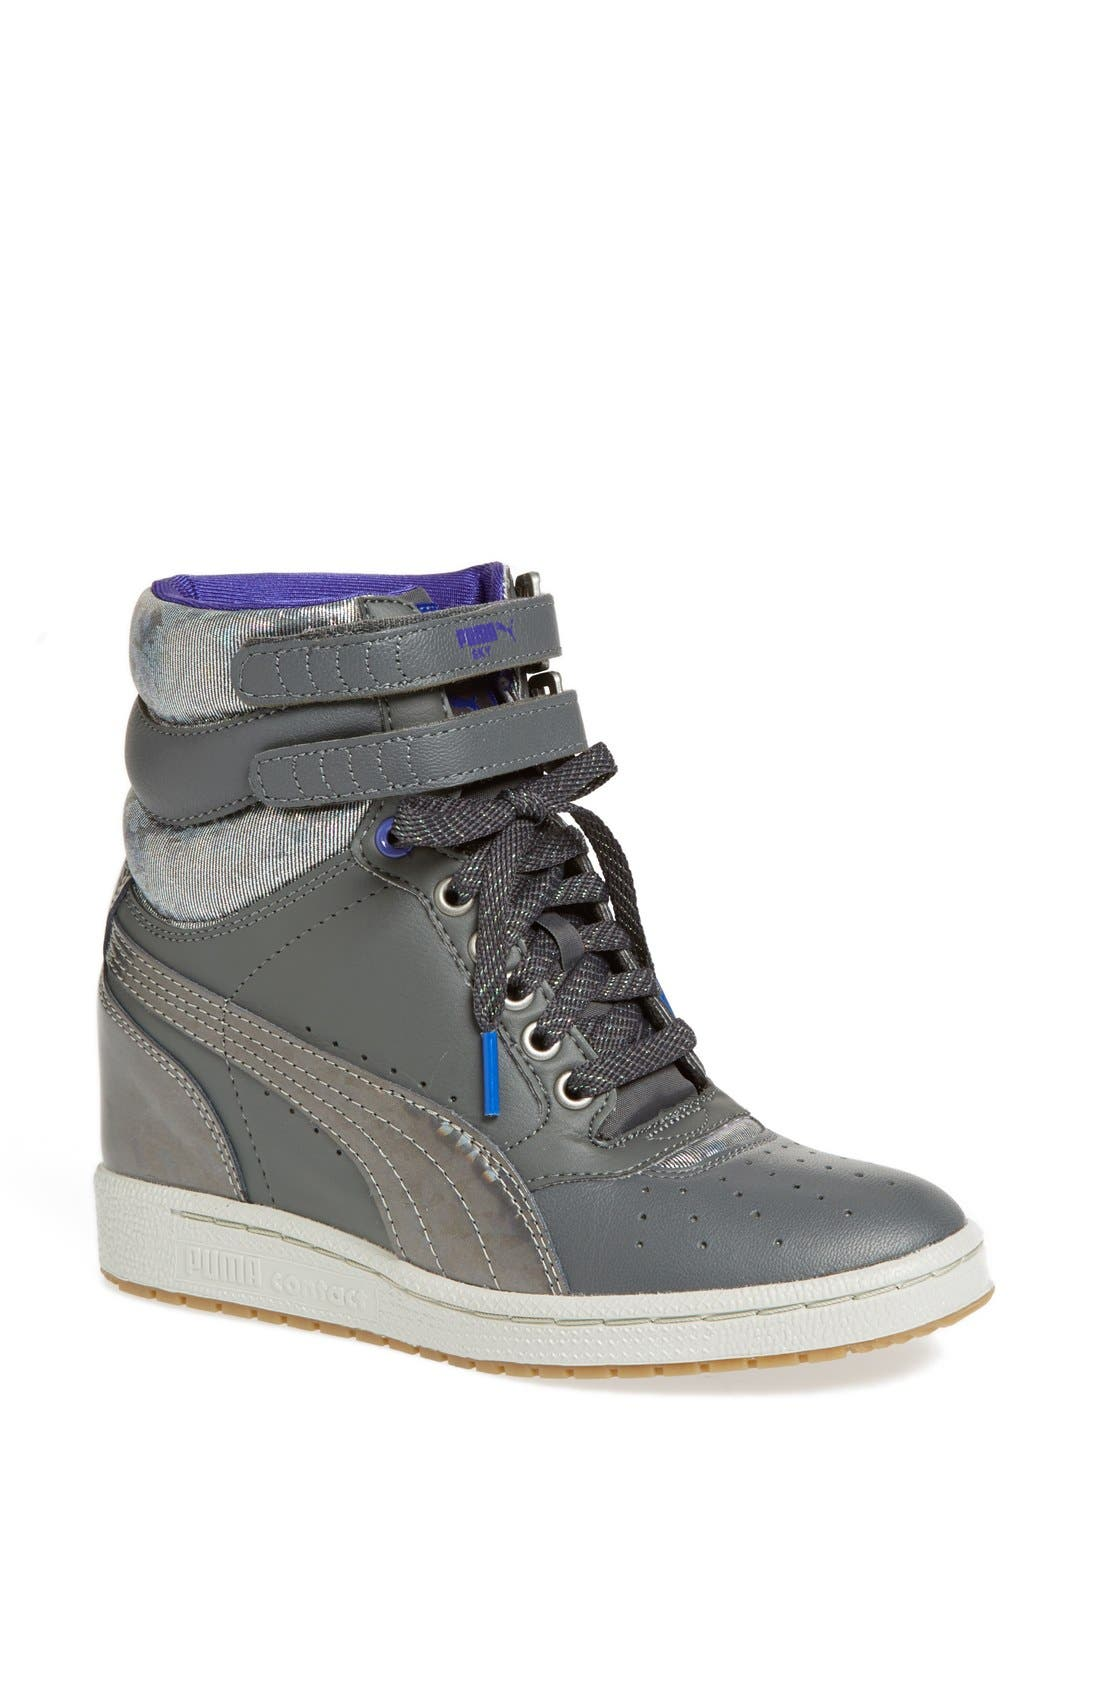 Alternate Image 1 Selected - PUMA 'Sky Wedge' Sneaker (Women)